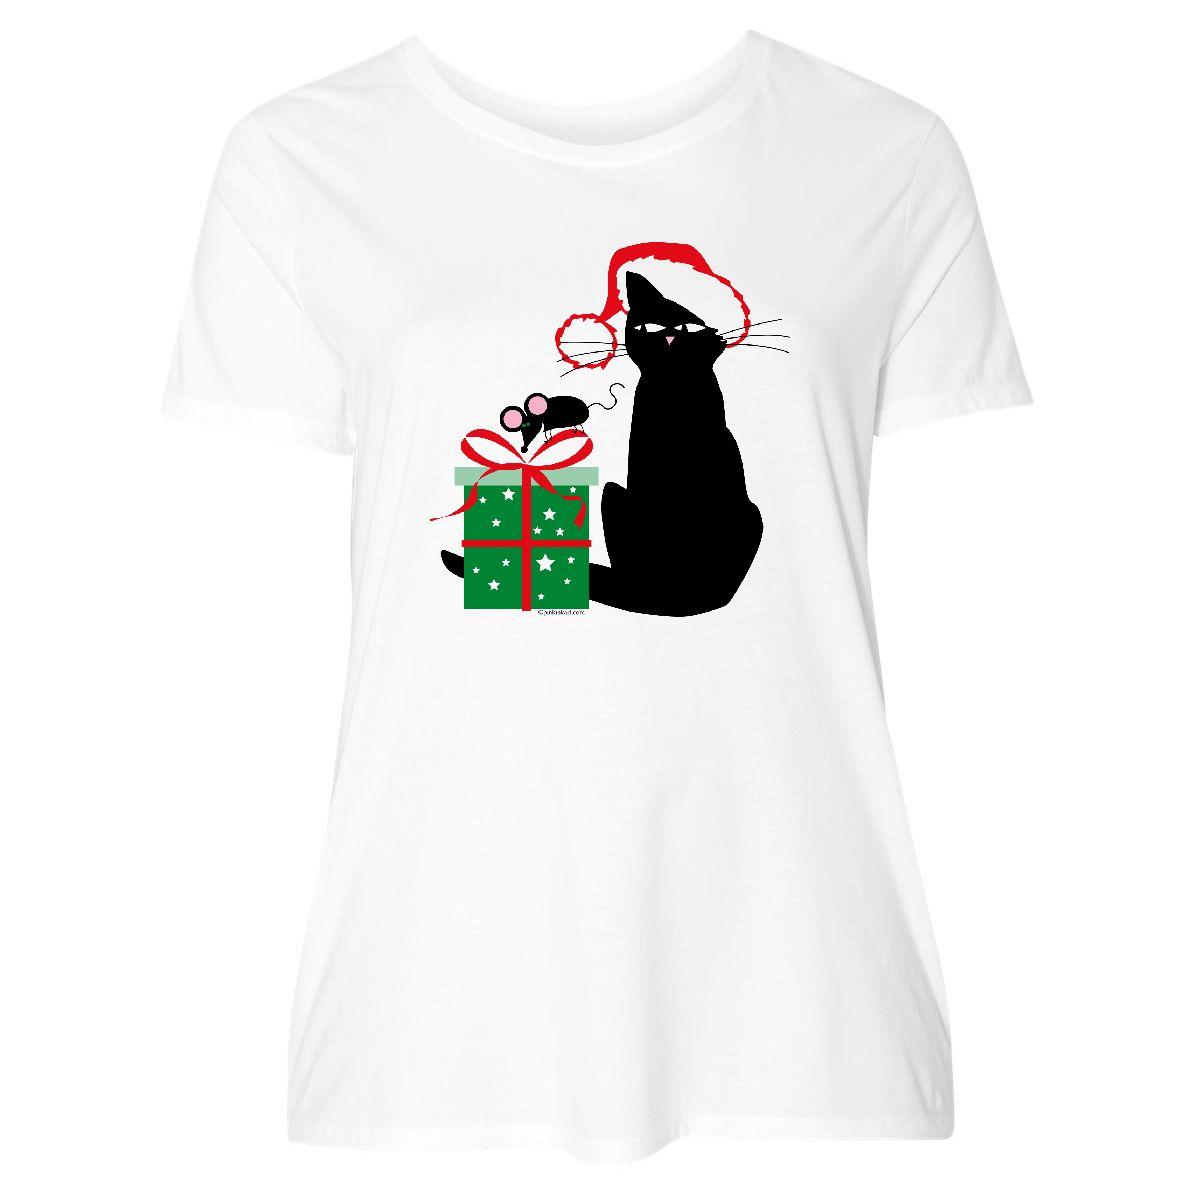 3ca1c9c8c1a Womens Plus Size Funny T Shirts - BCD Tofu House